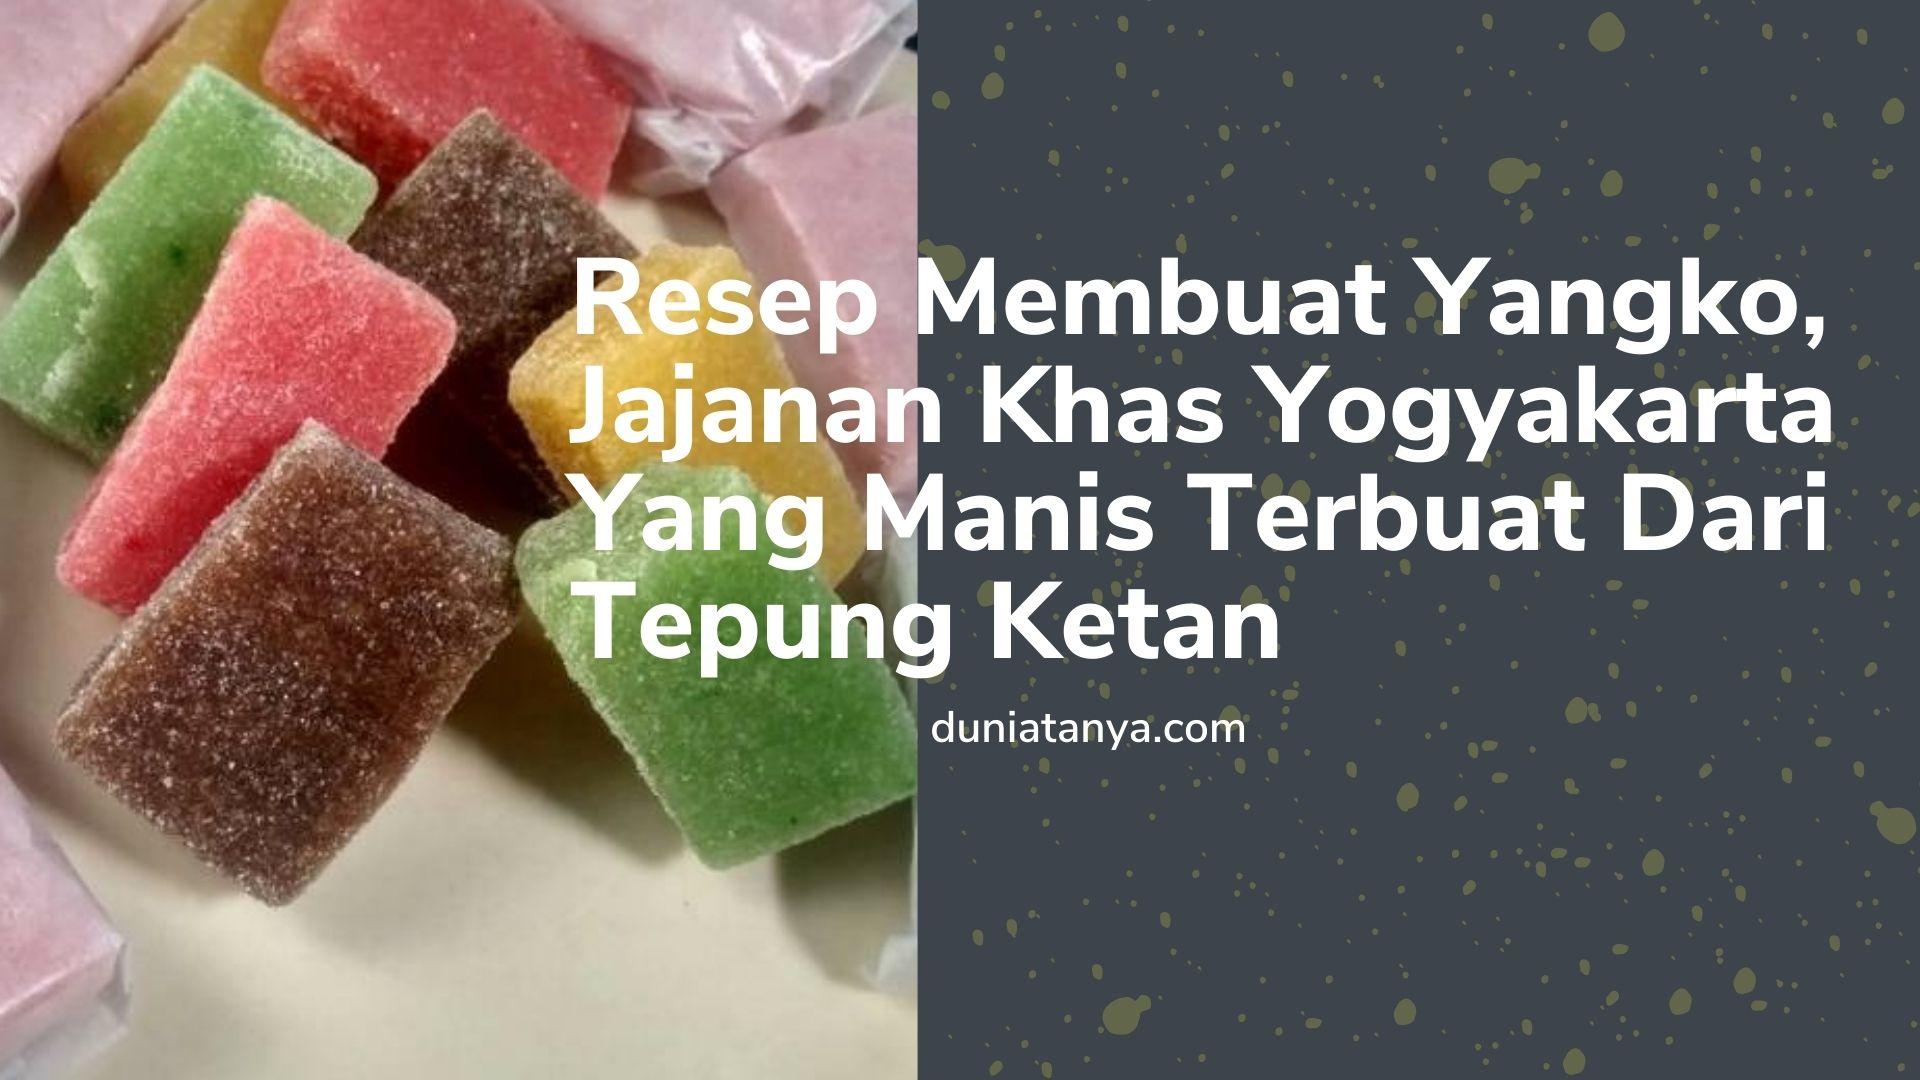 Read more about the article Resep Membuat Yangko,Jajanan Khas Yogyakarta Yang Manis Terbuat Dari Tepung Ketan